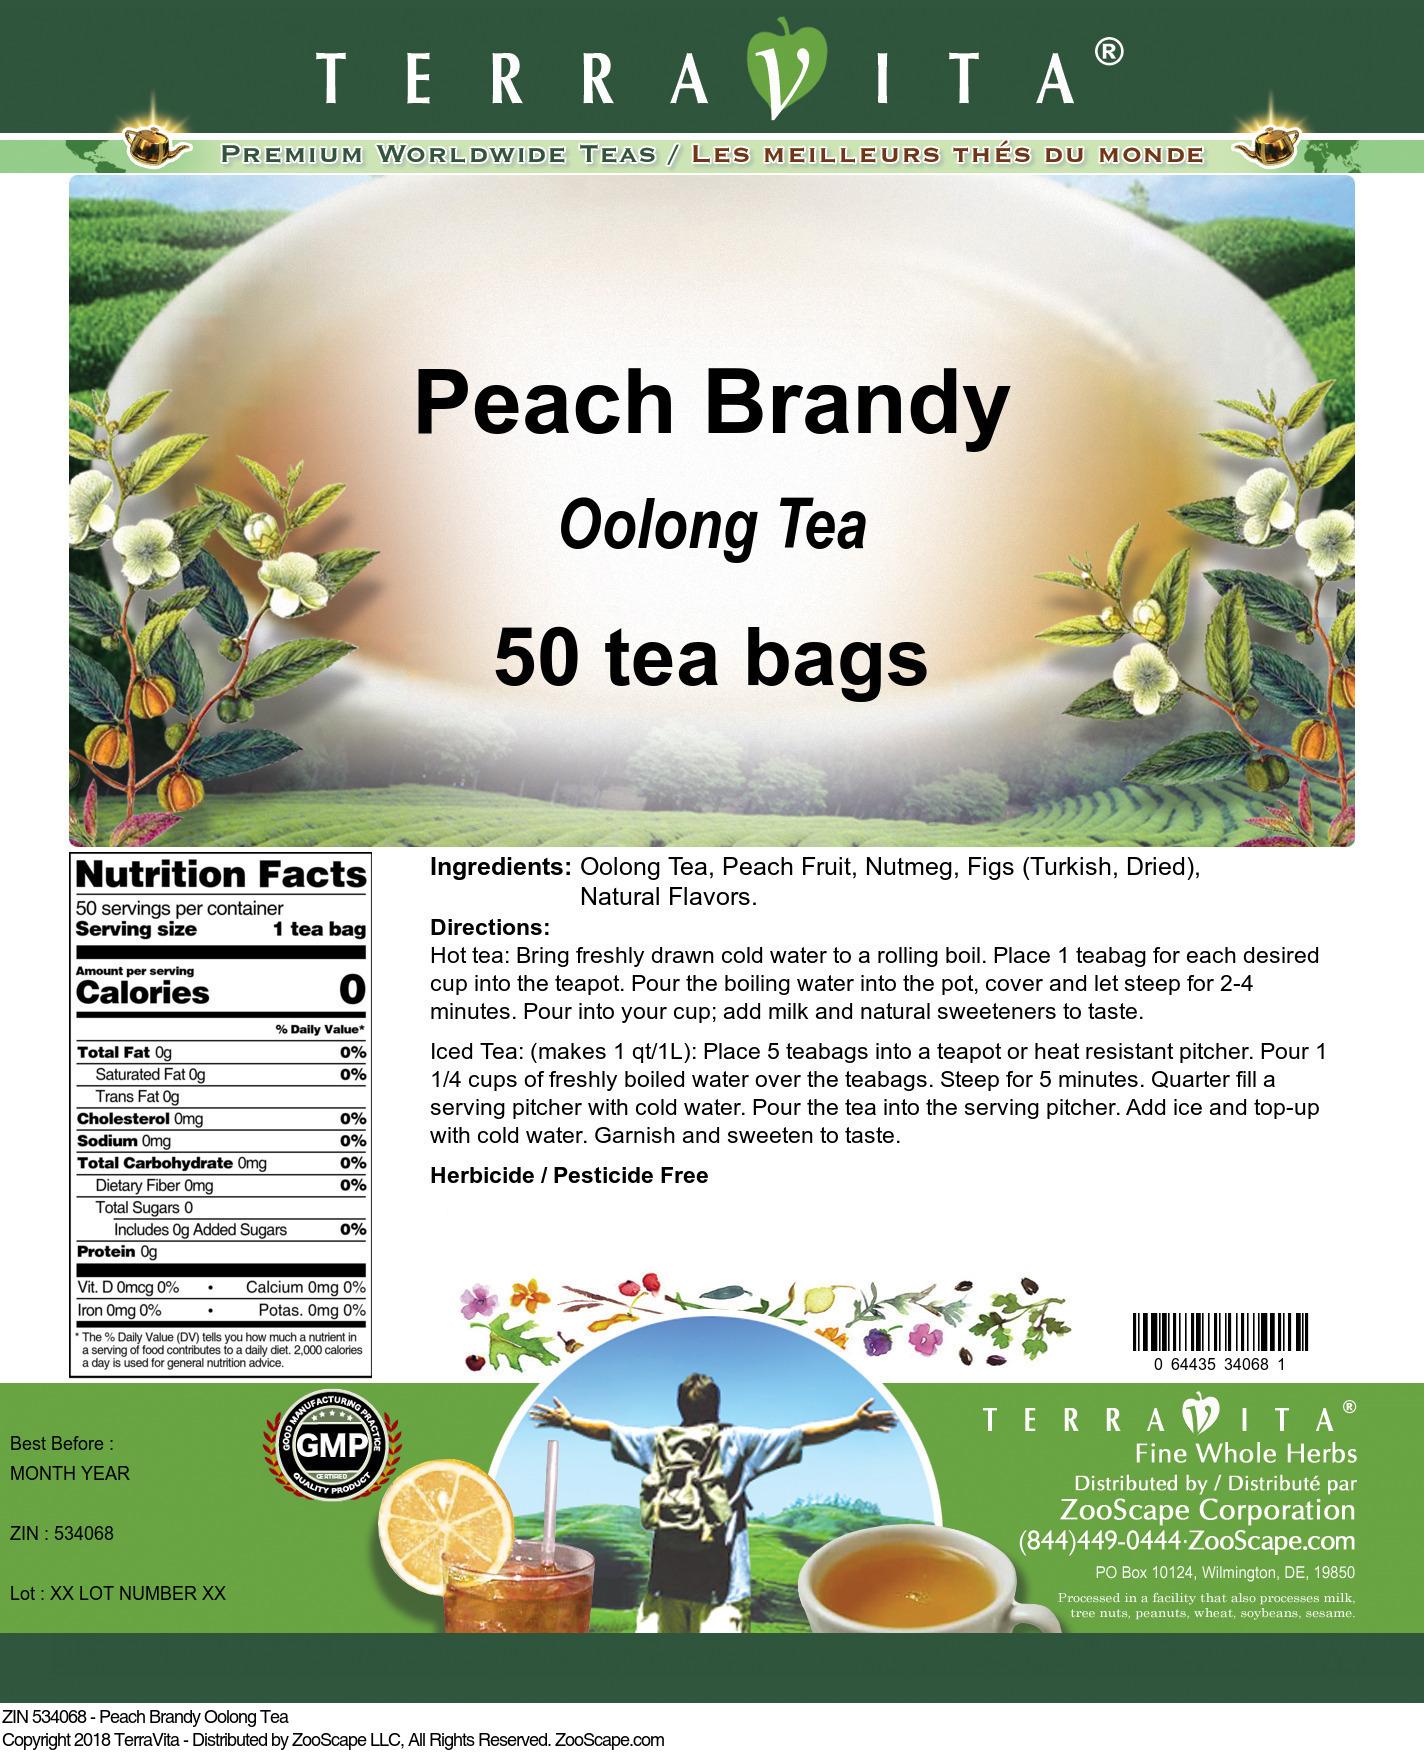 Peach Brandy Oolong Tea